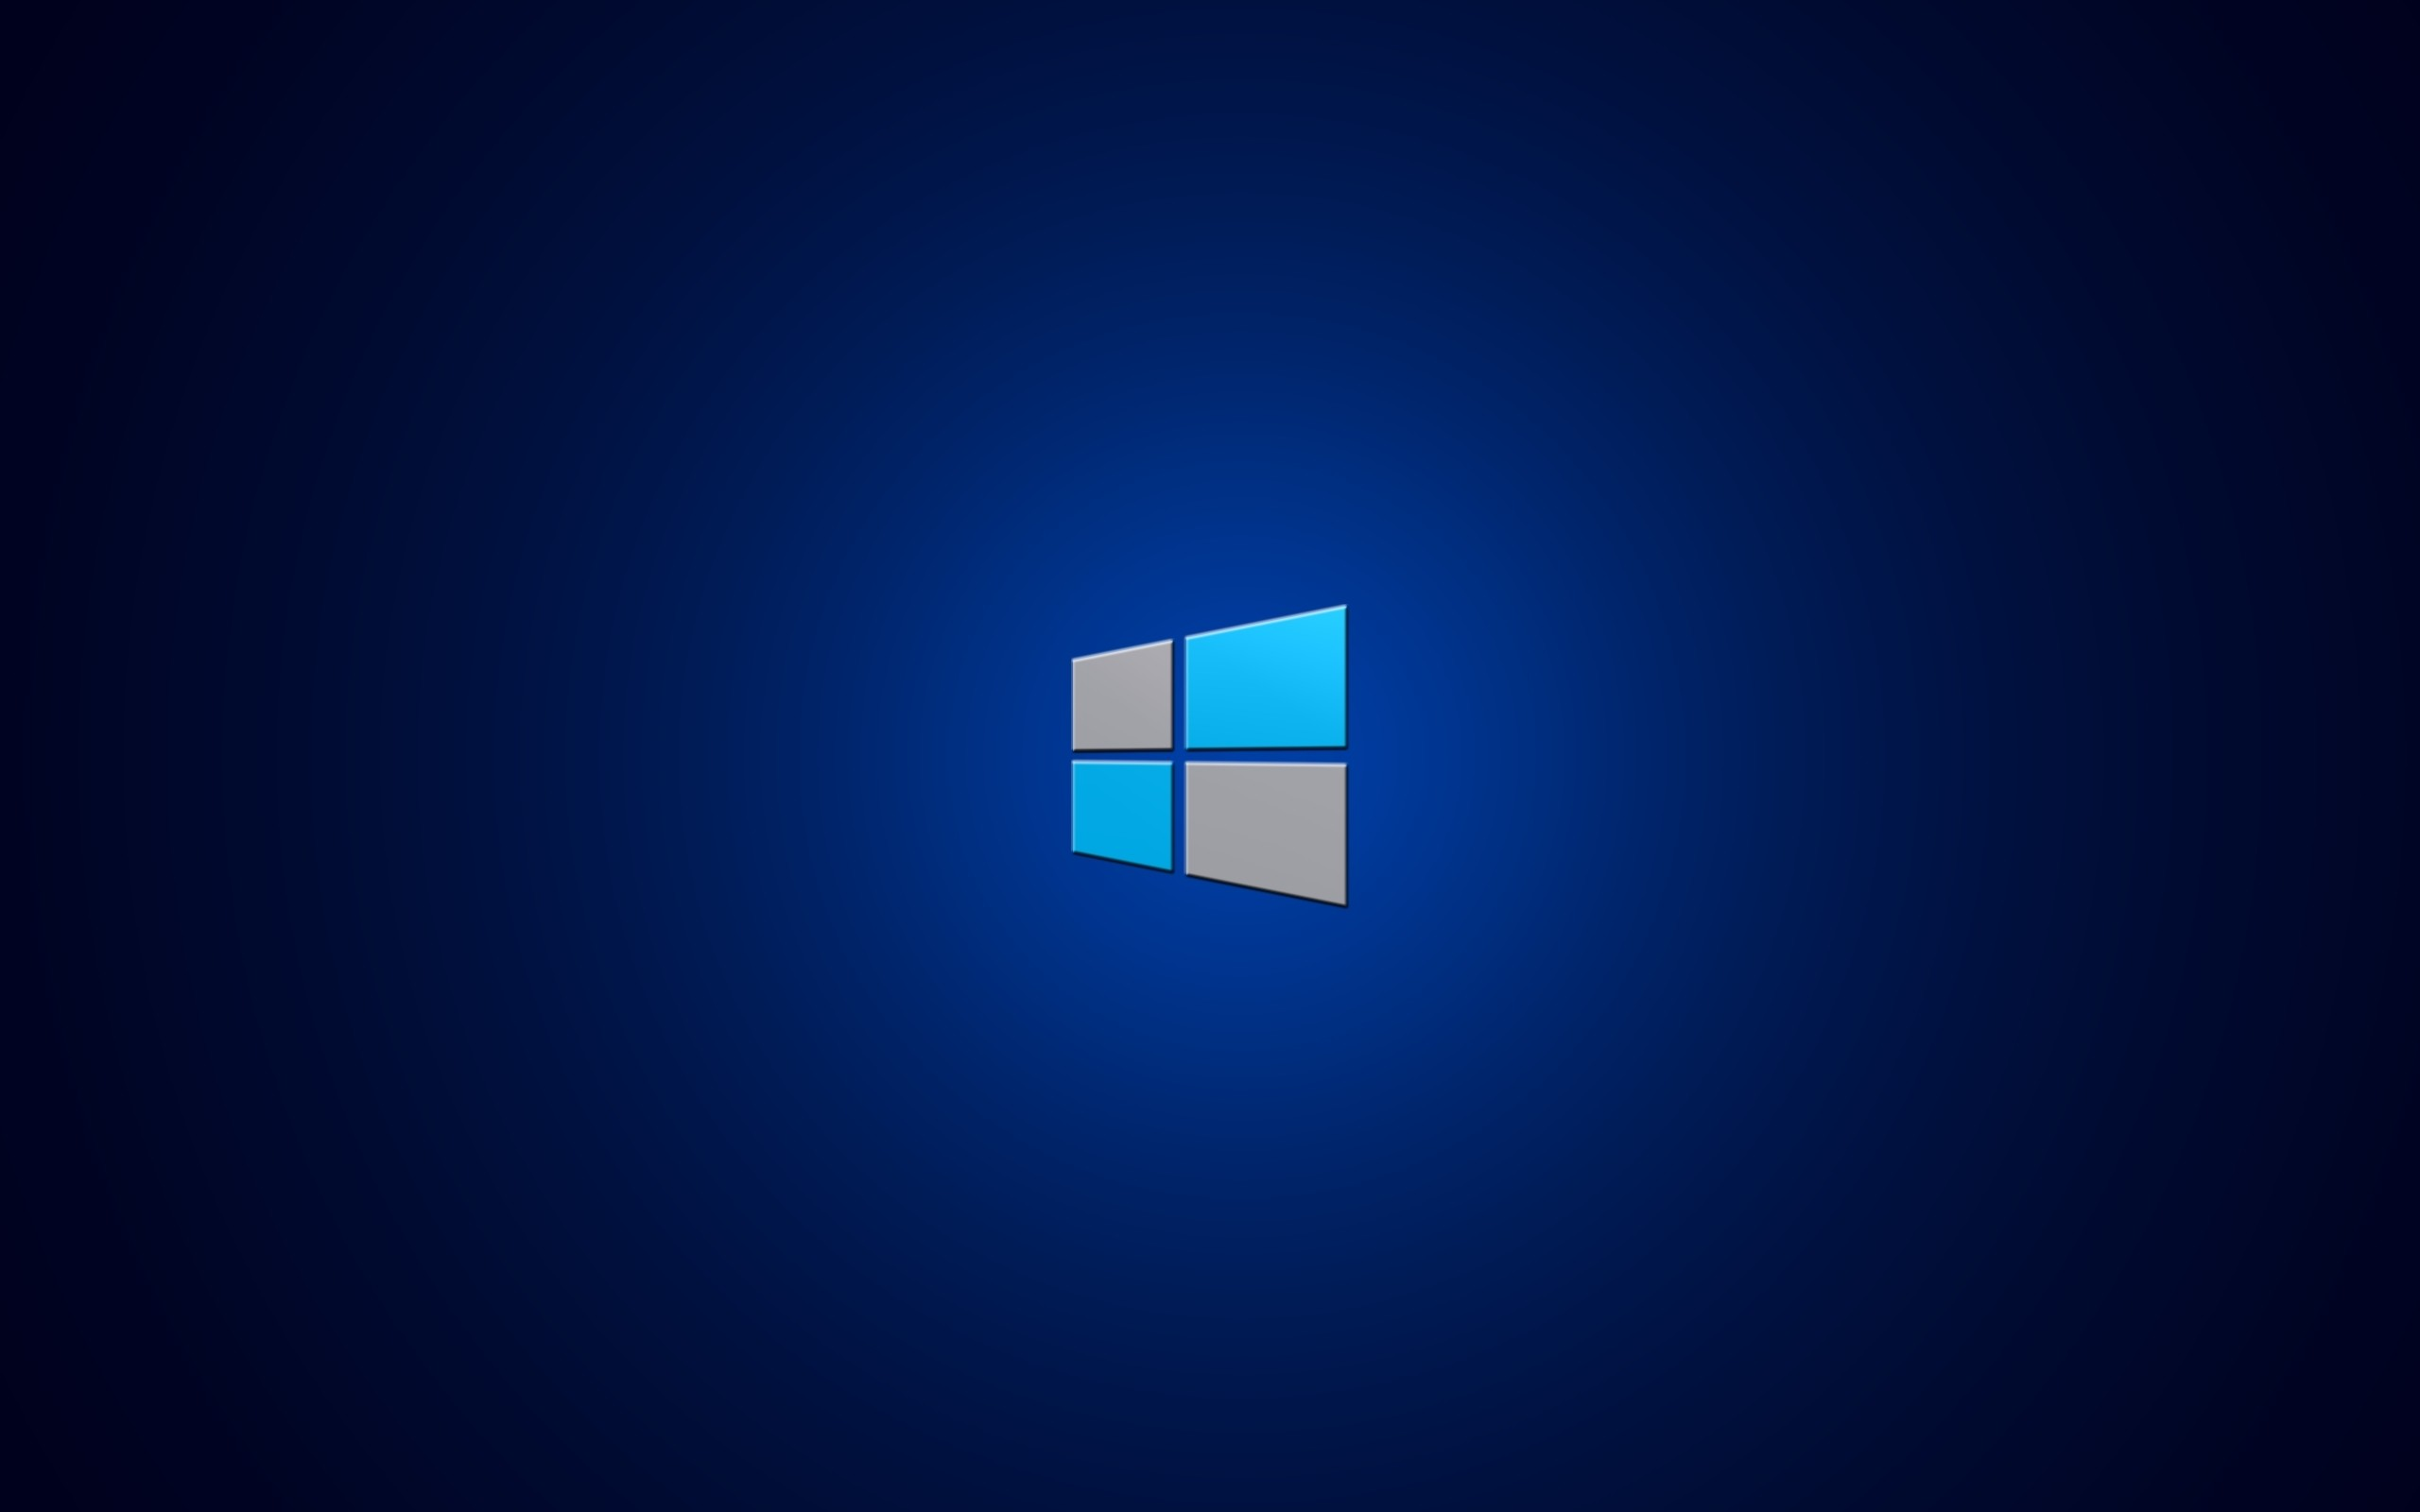 Windows Server 2018 Wallpaper ·① WallpaperTag